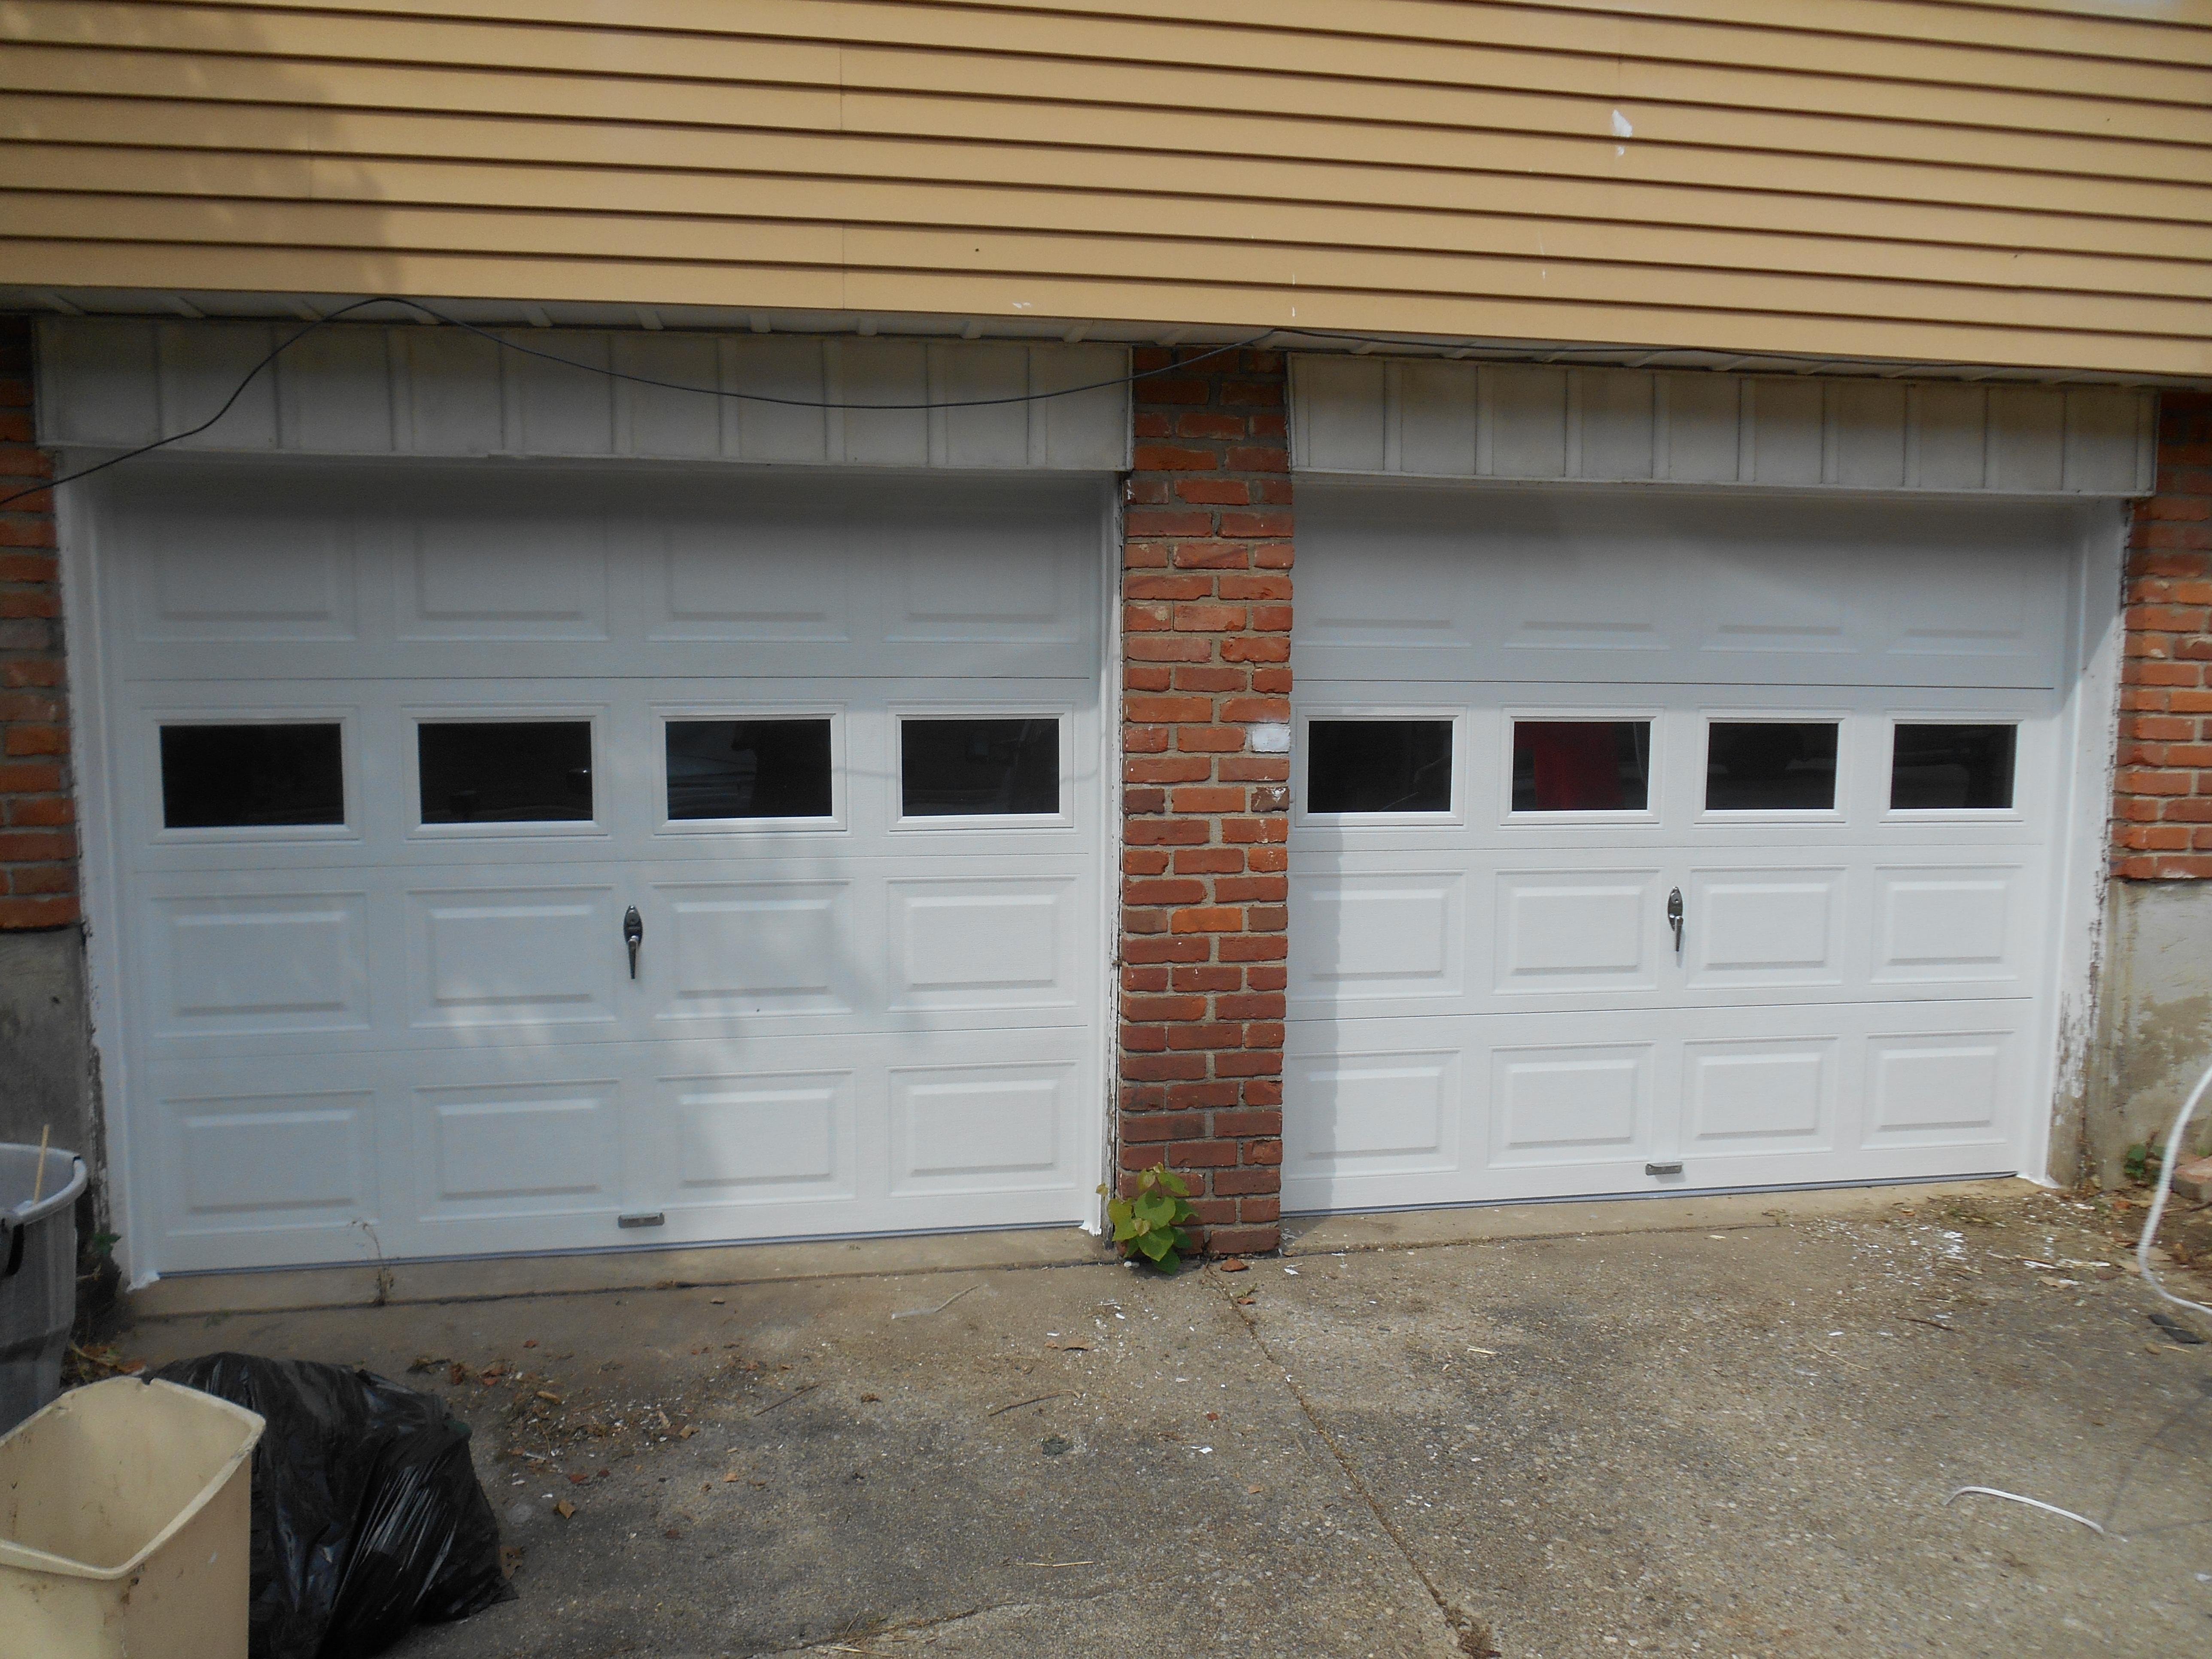 170 Series with standard windows